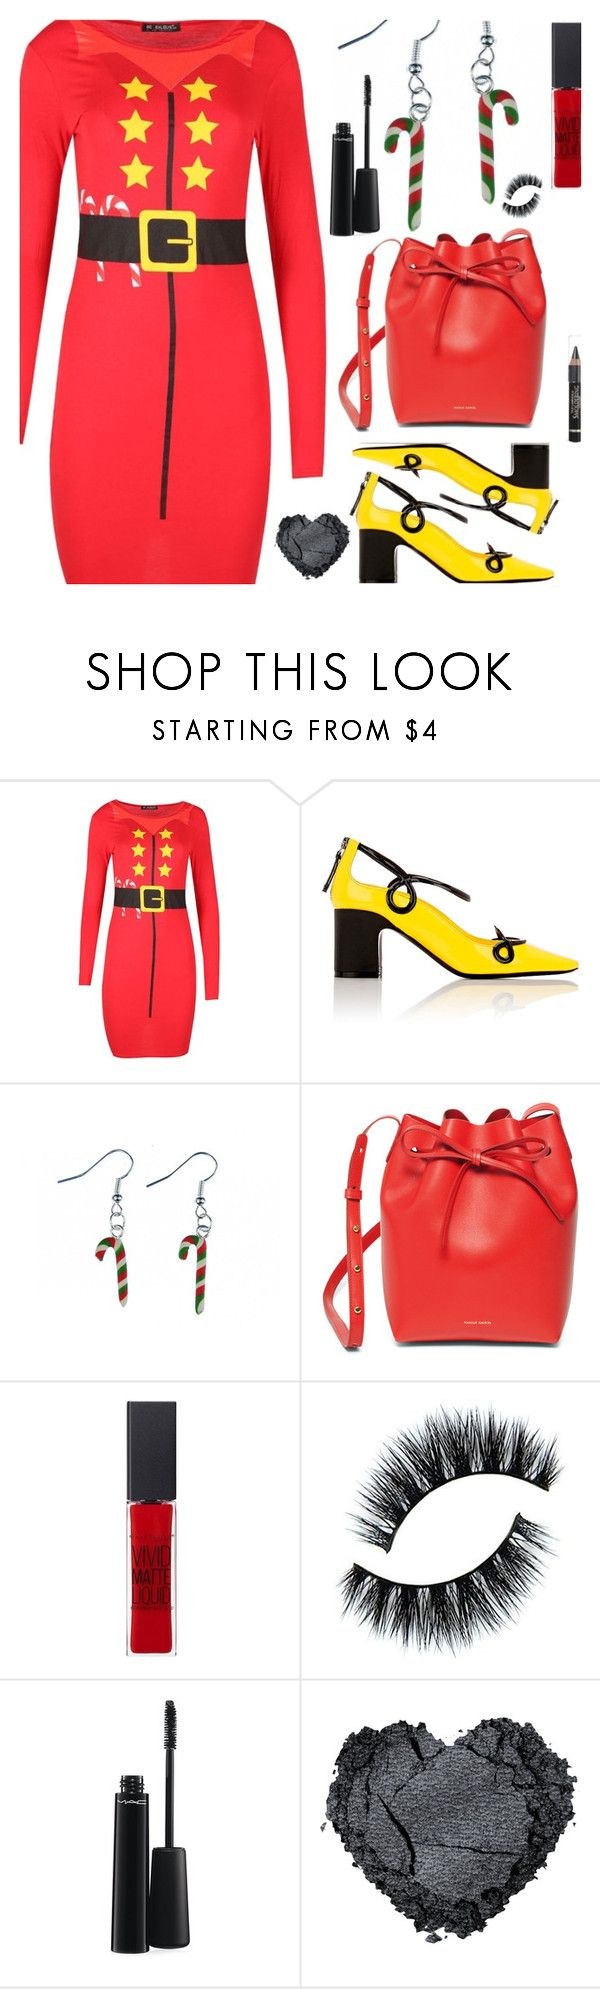 """Christmas Print Dress"" by deborah-calton ❤ liked on Polyvore featuring Fabrizio Viti, Mansur Gavriel, Maybelline, MAC Cosmetics and L'Oréal Paris"